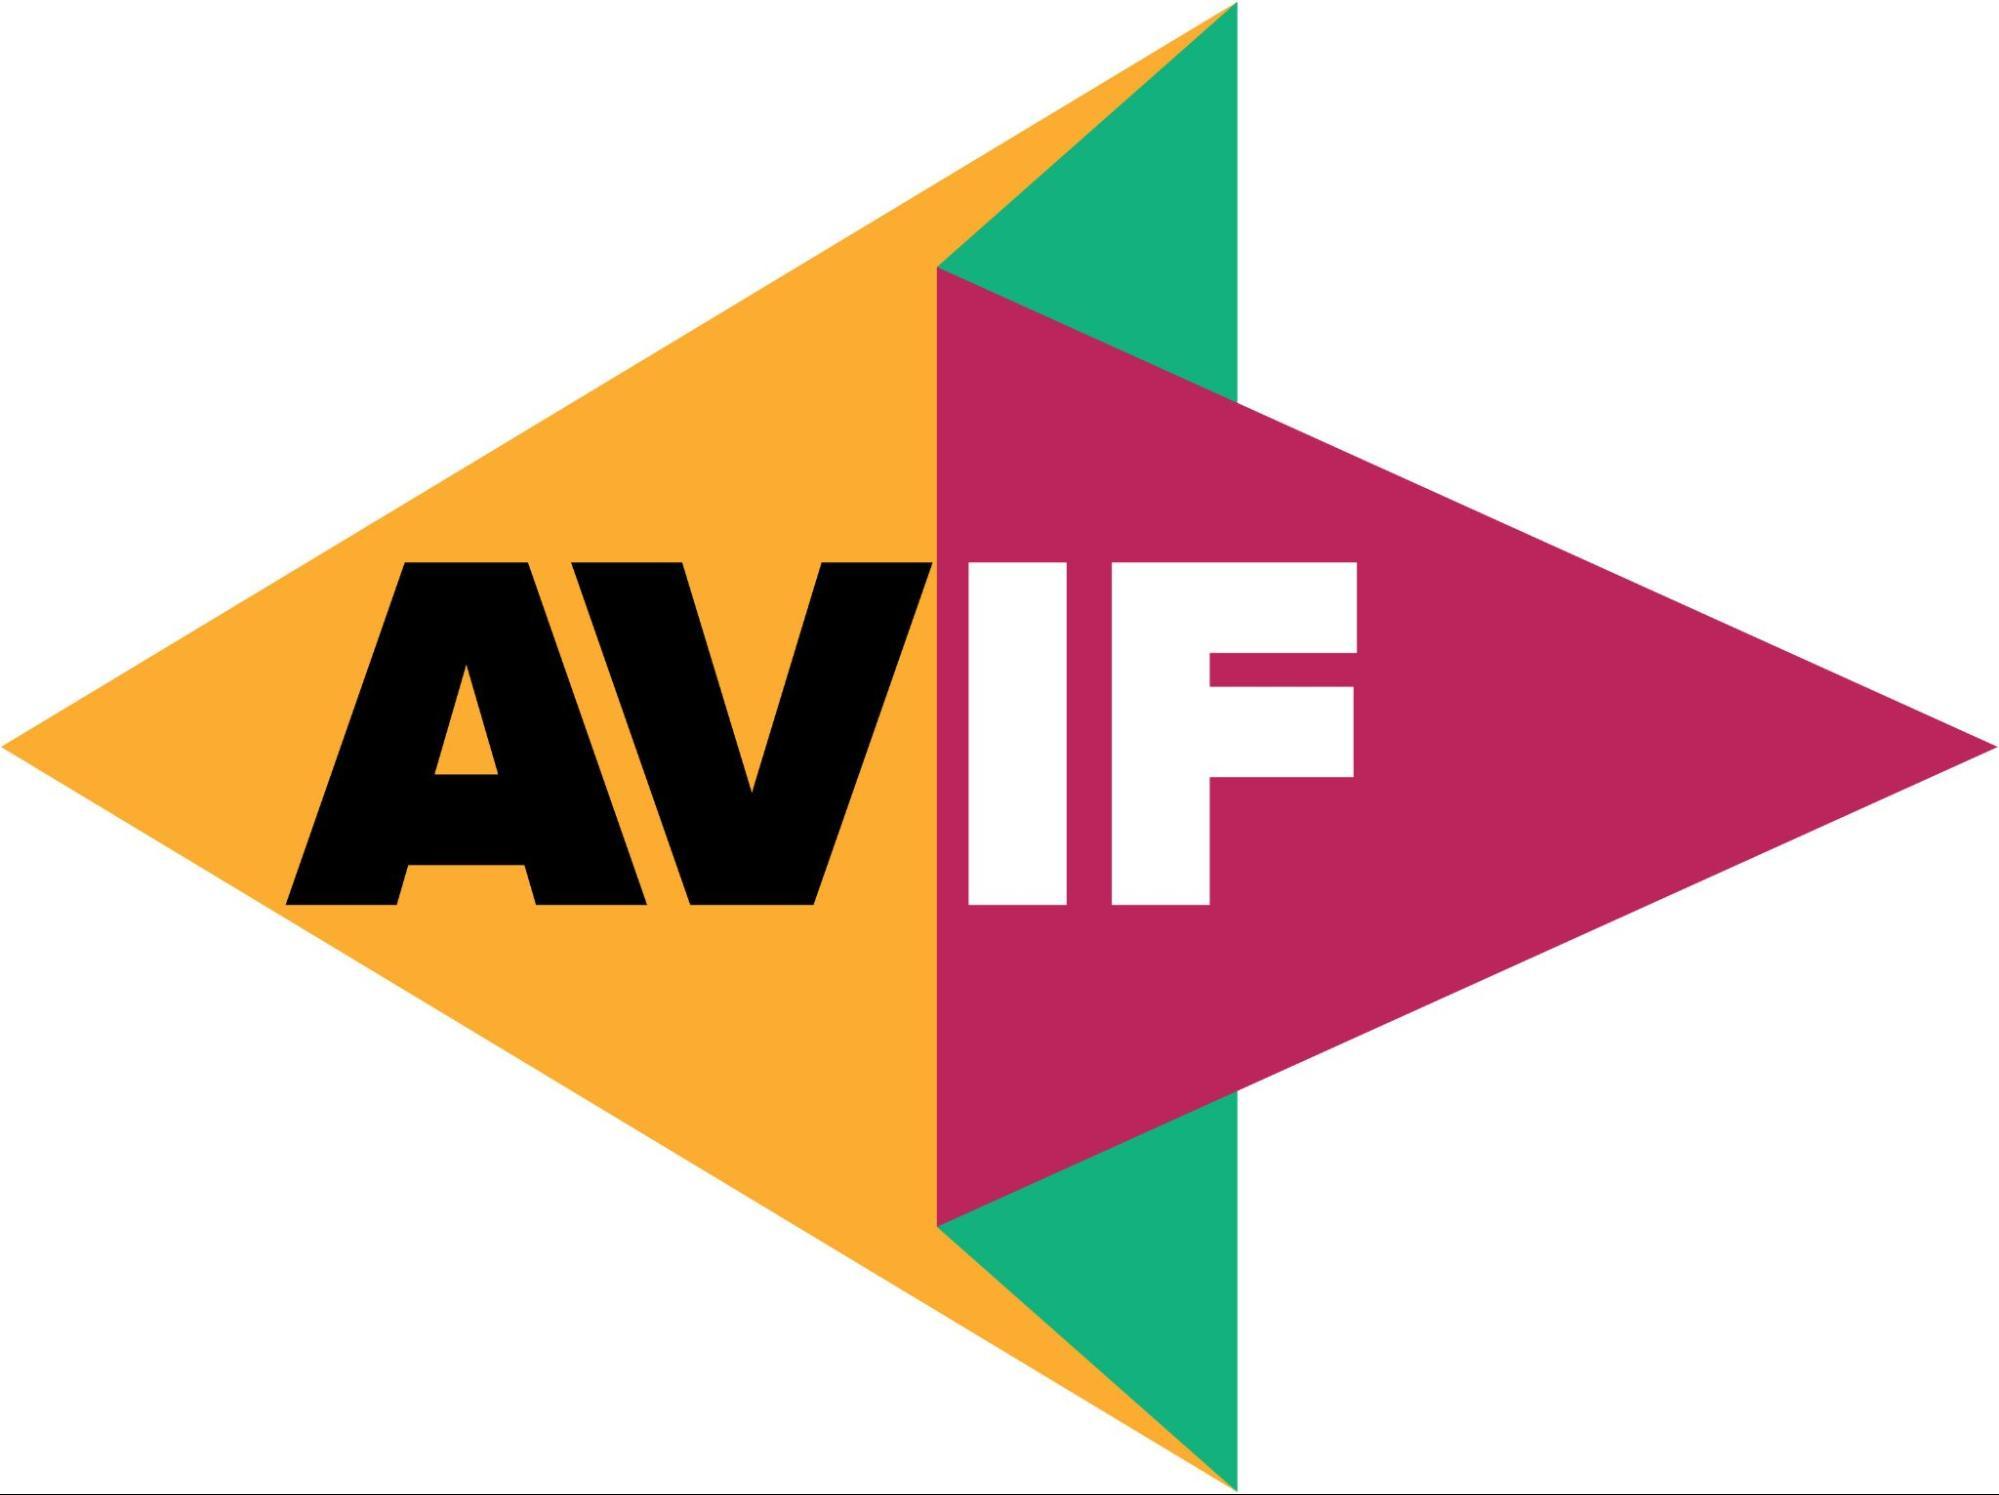 The AVIF logo